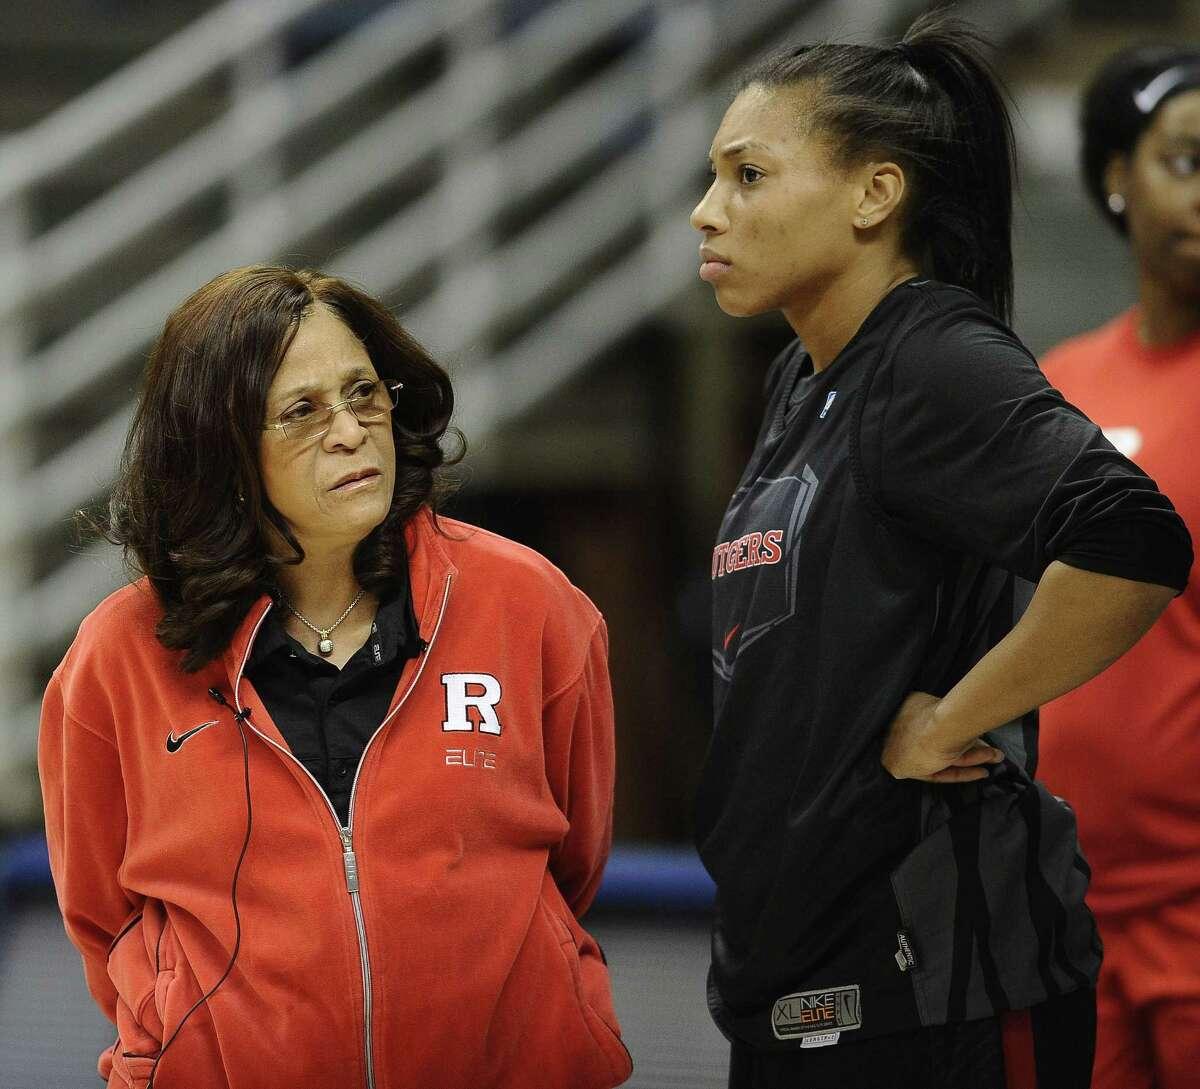 Rutgers head coach C. Vivian Stringer, left, stands with Betnijah Laney during a recent practice.